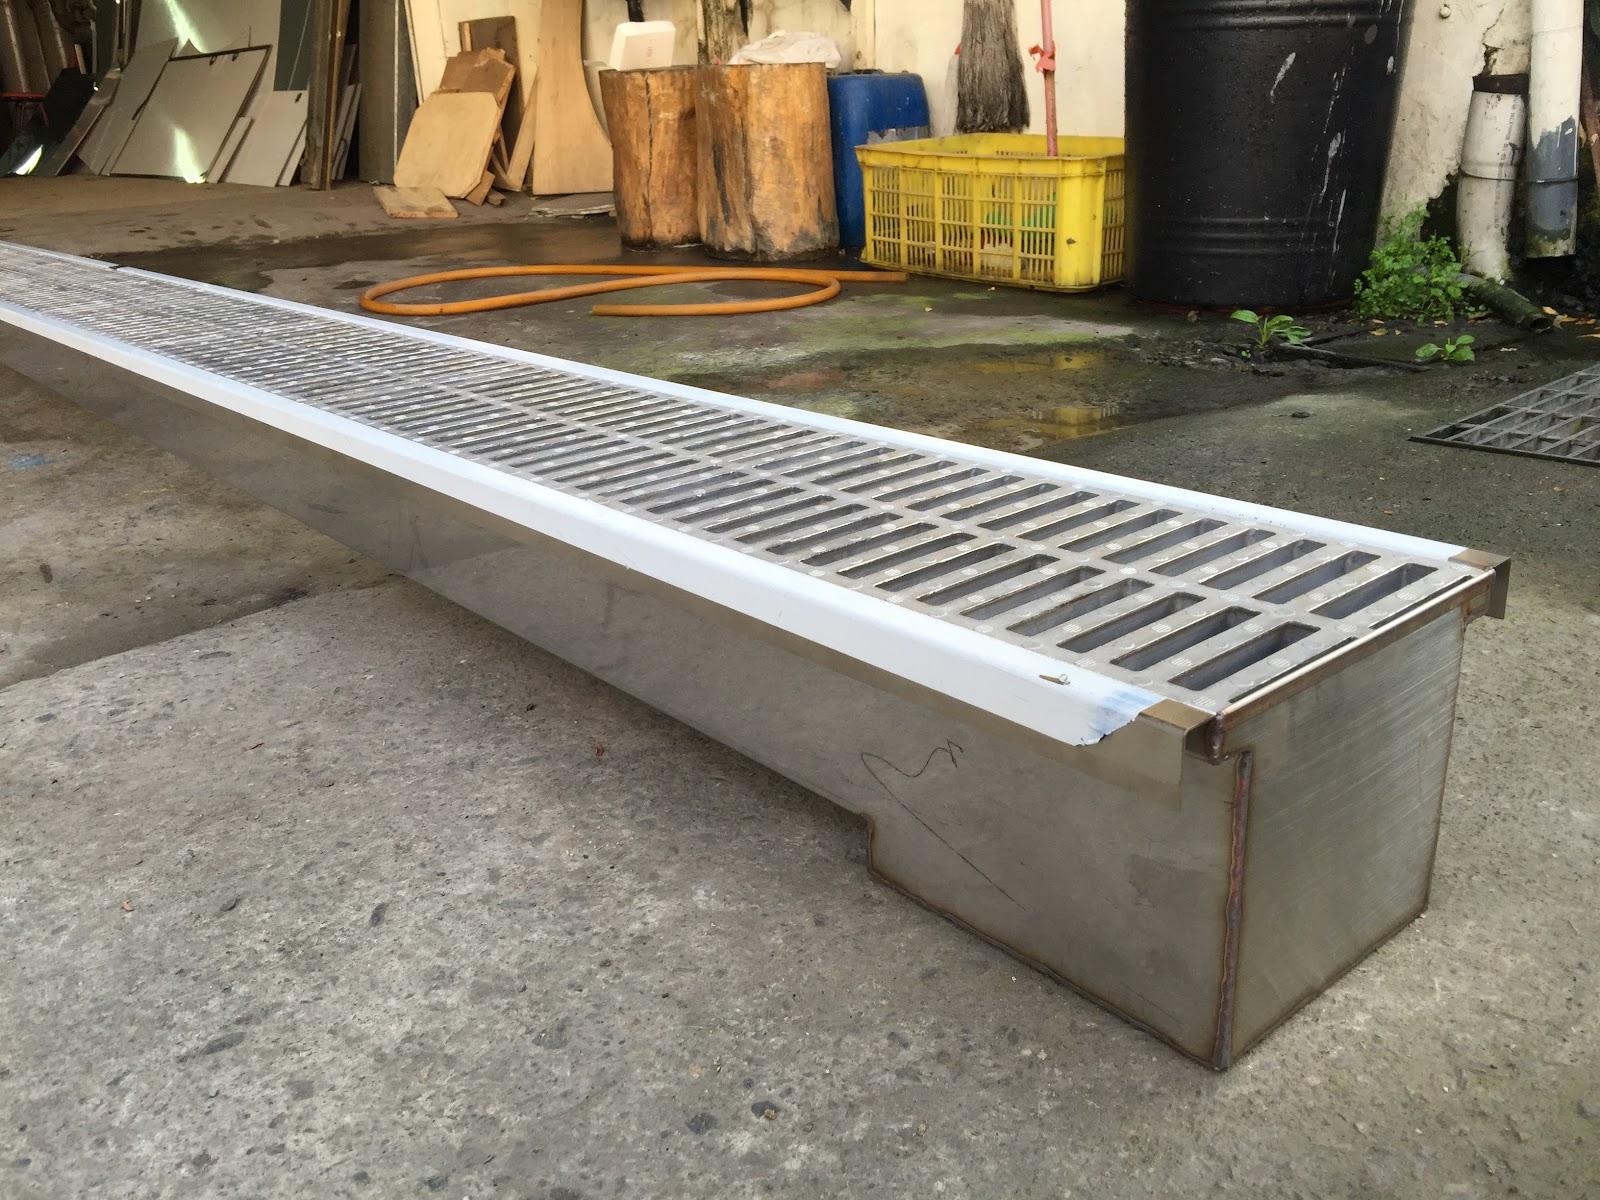 kitchen sink drain tudor remodel 400公分白鐵廚房水溝、白鐵截油槽、鈻製水溝蓋、截油槽 ...